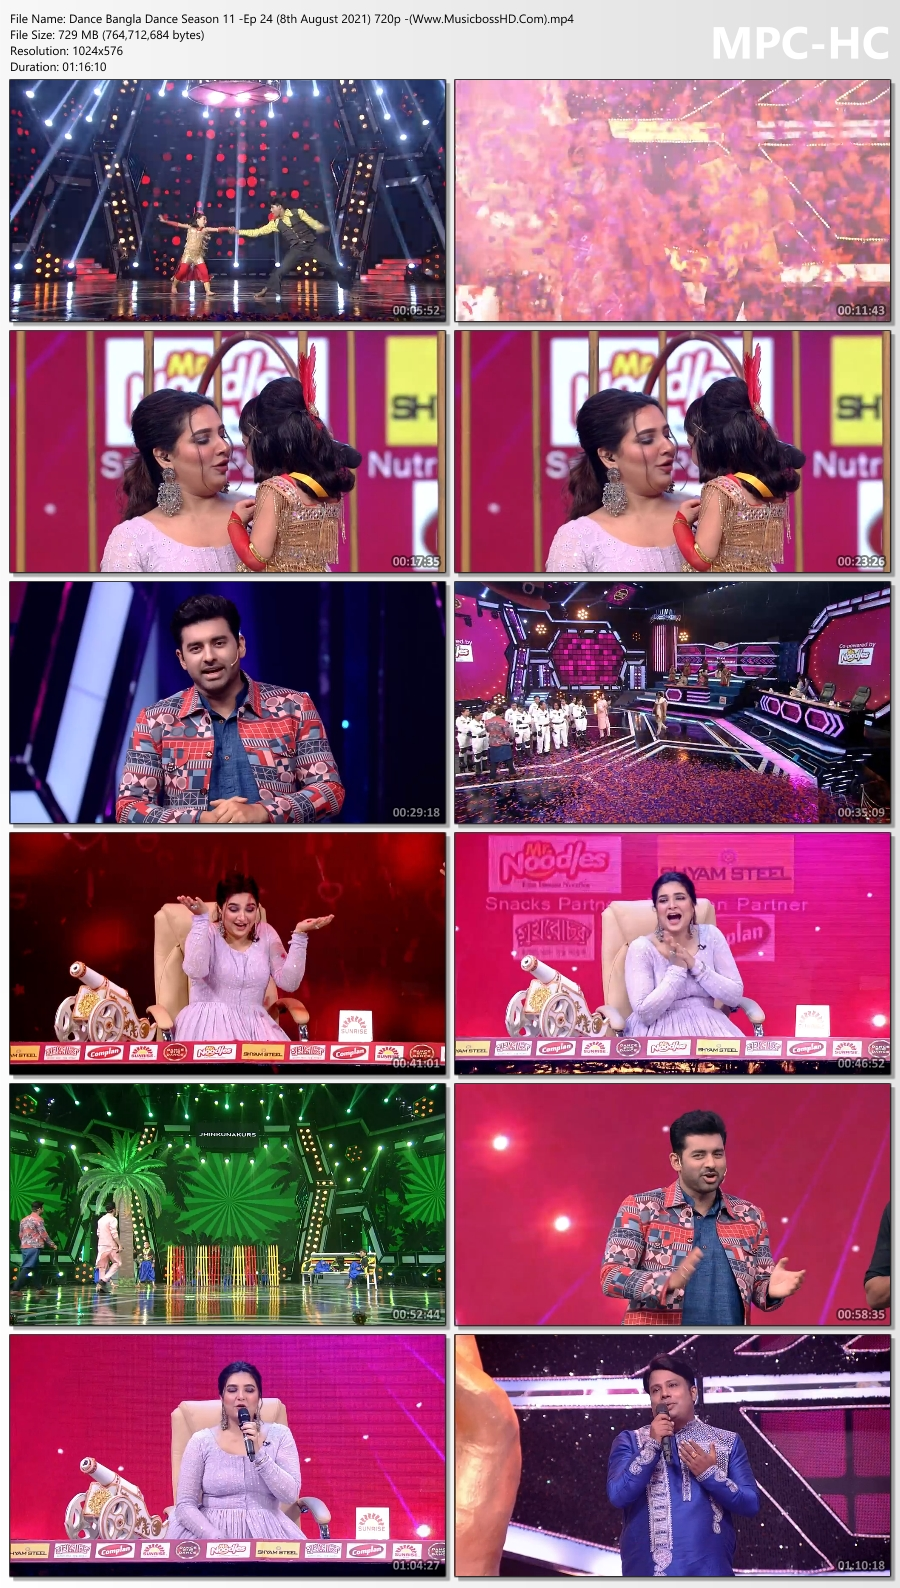 Dance-Bangla-Dance-Season-11-Ep-24-8th-August-2021-720p-Www-Musicboss-HD-Com-mp4-thumbs